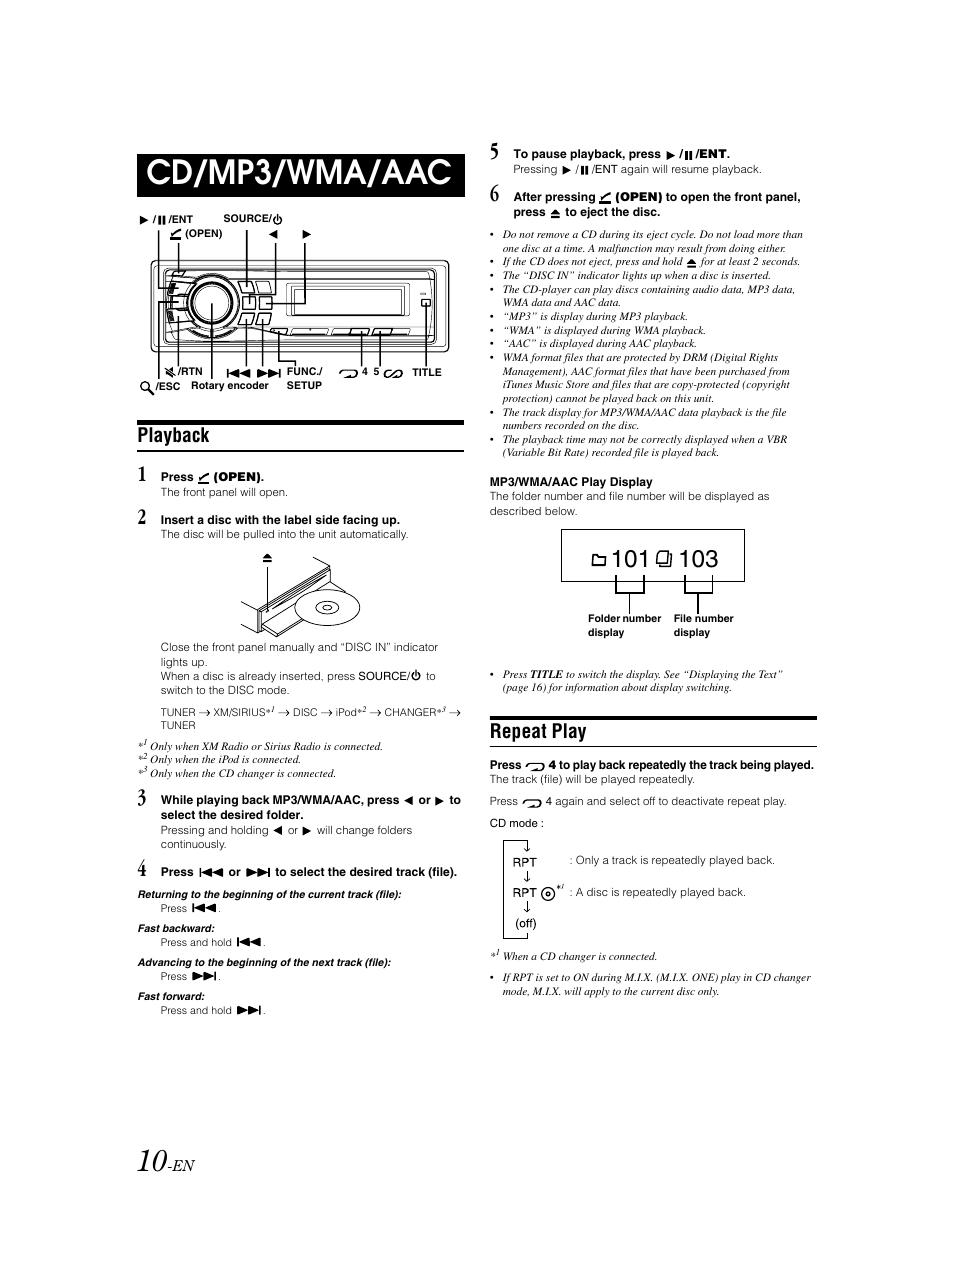 cda 9883 manual